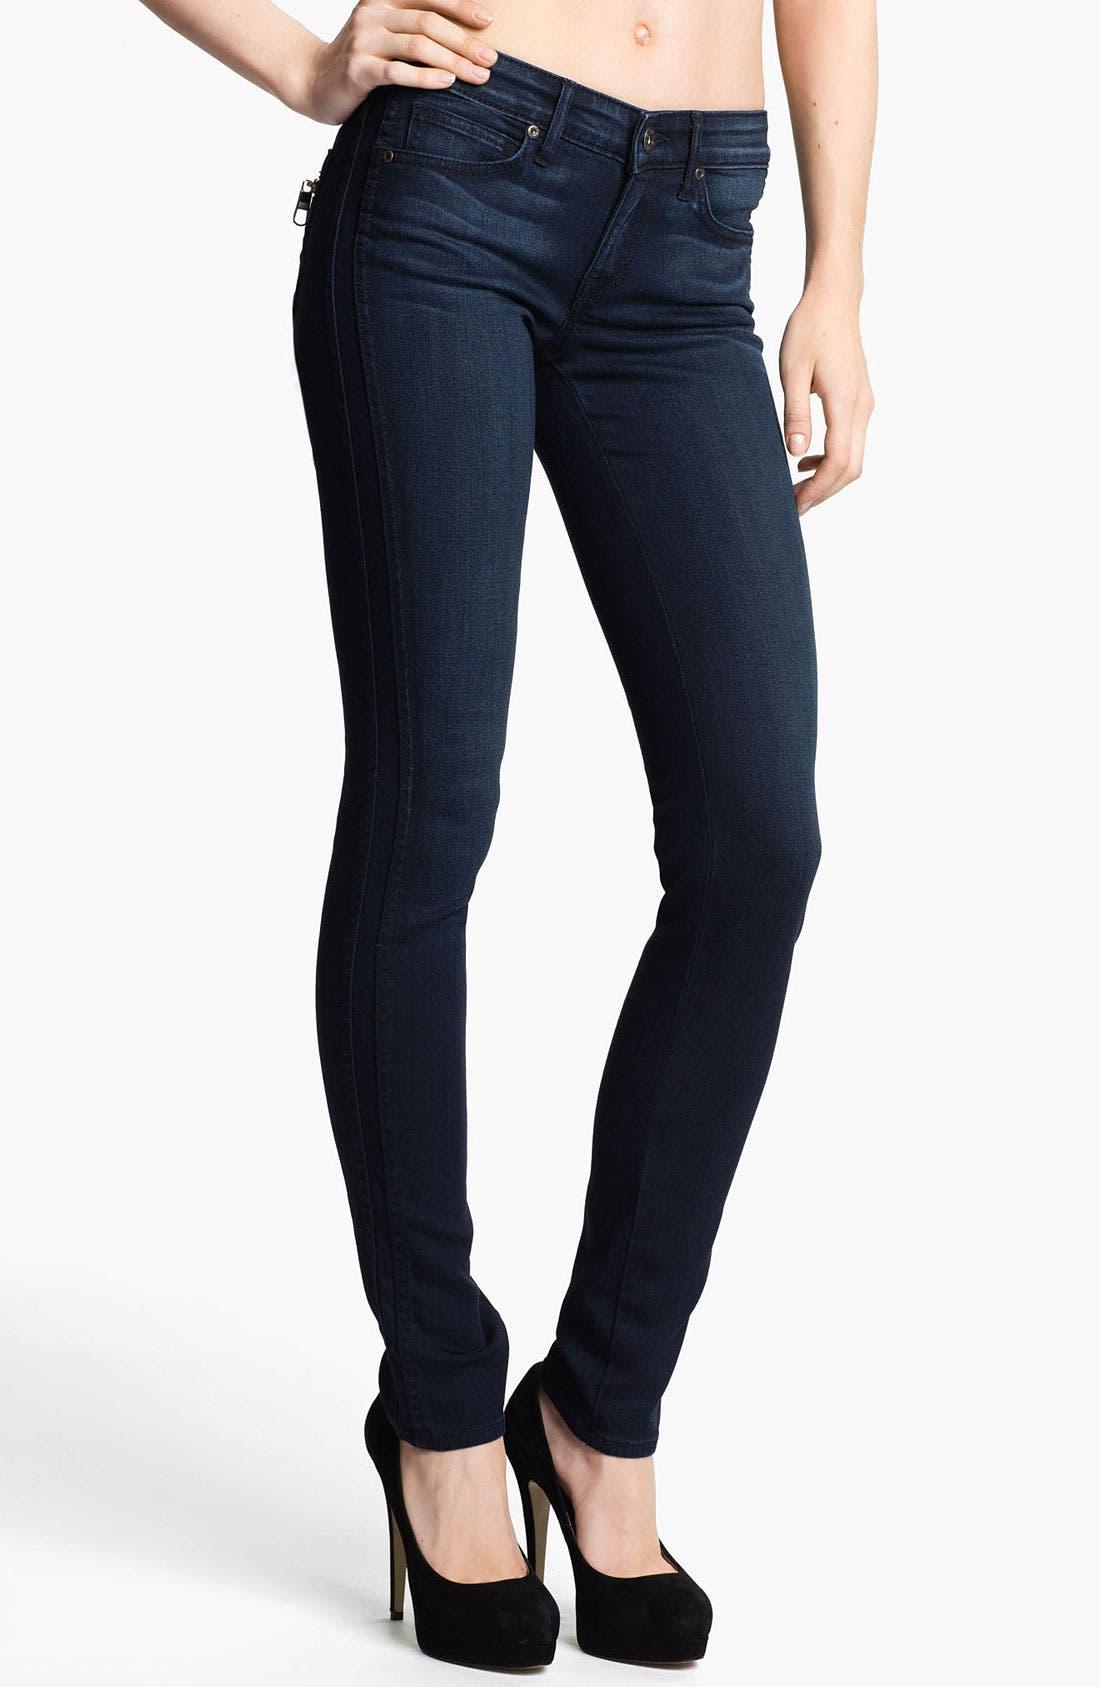 Alternate Image 1 Selected - Rich & Skinny 'Tuxedo' Skinny Jeans (Zeus)